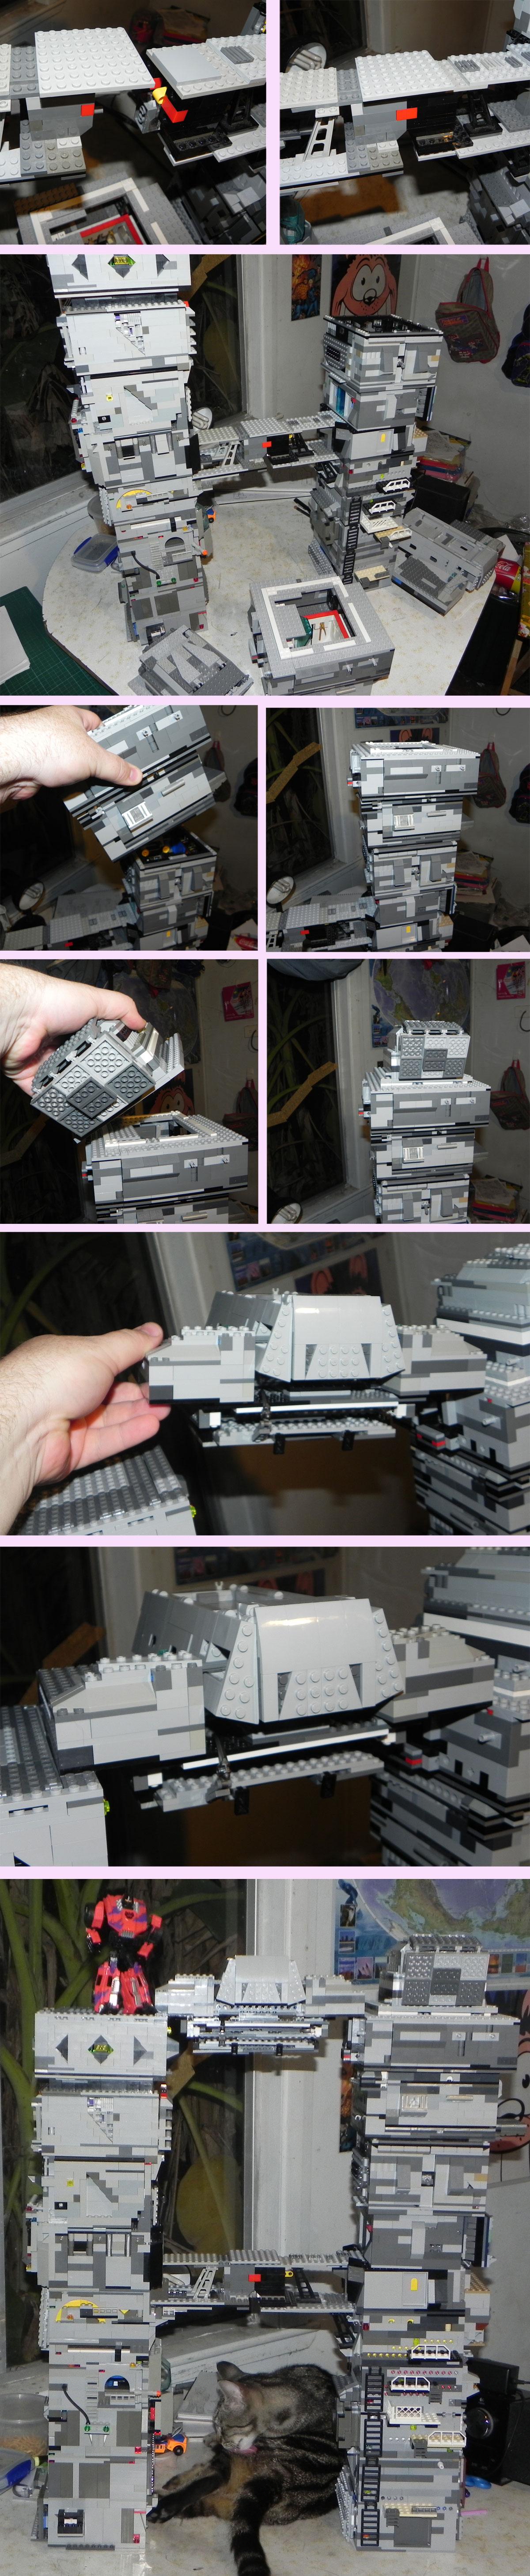 Space Bridge Update: Part 2: Assembly